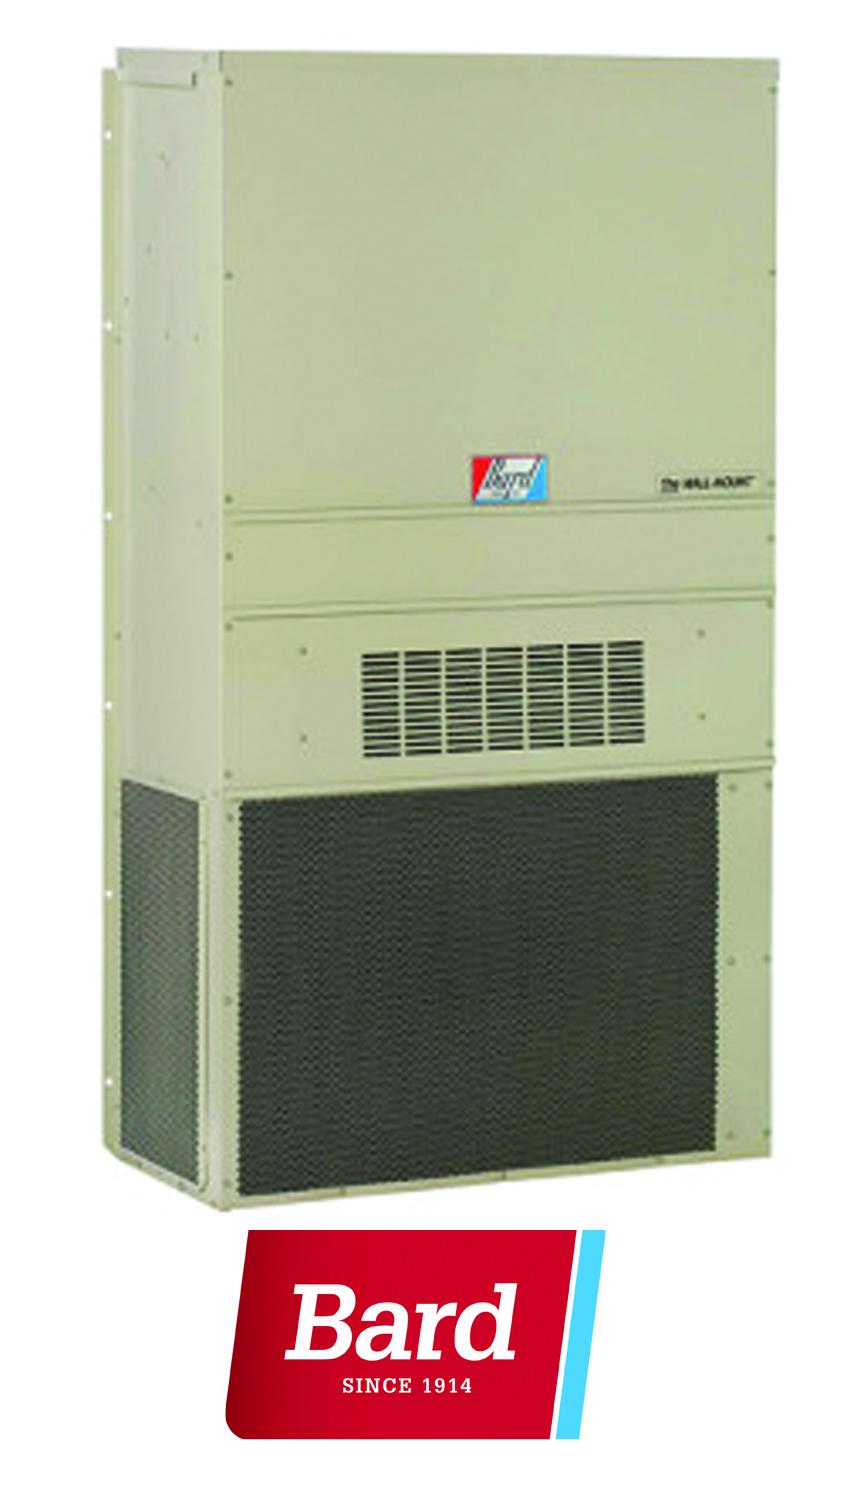 AIRES ACONDICIONADOS para DATA CENTERS - BARD HVAC - Tipo Mochila